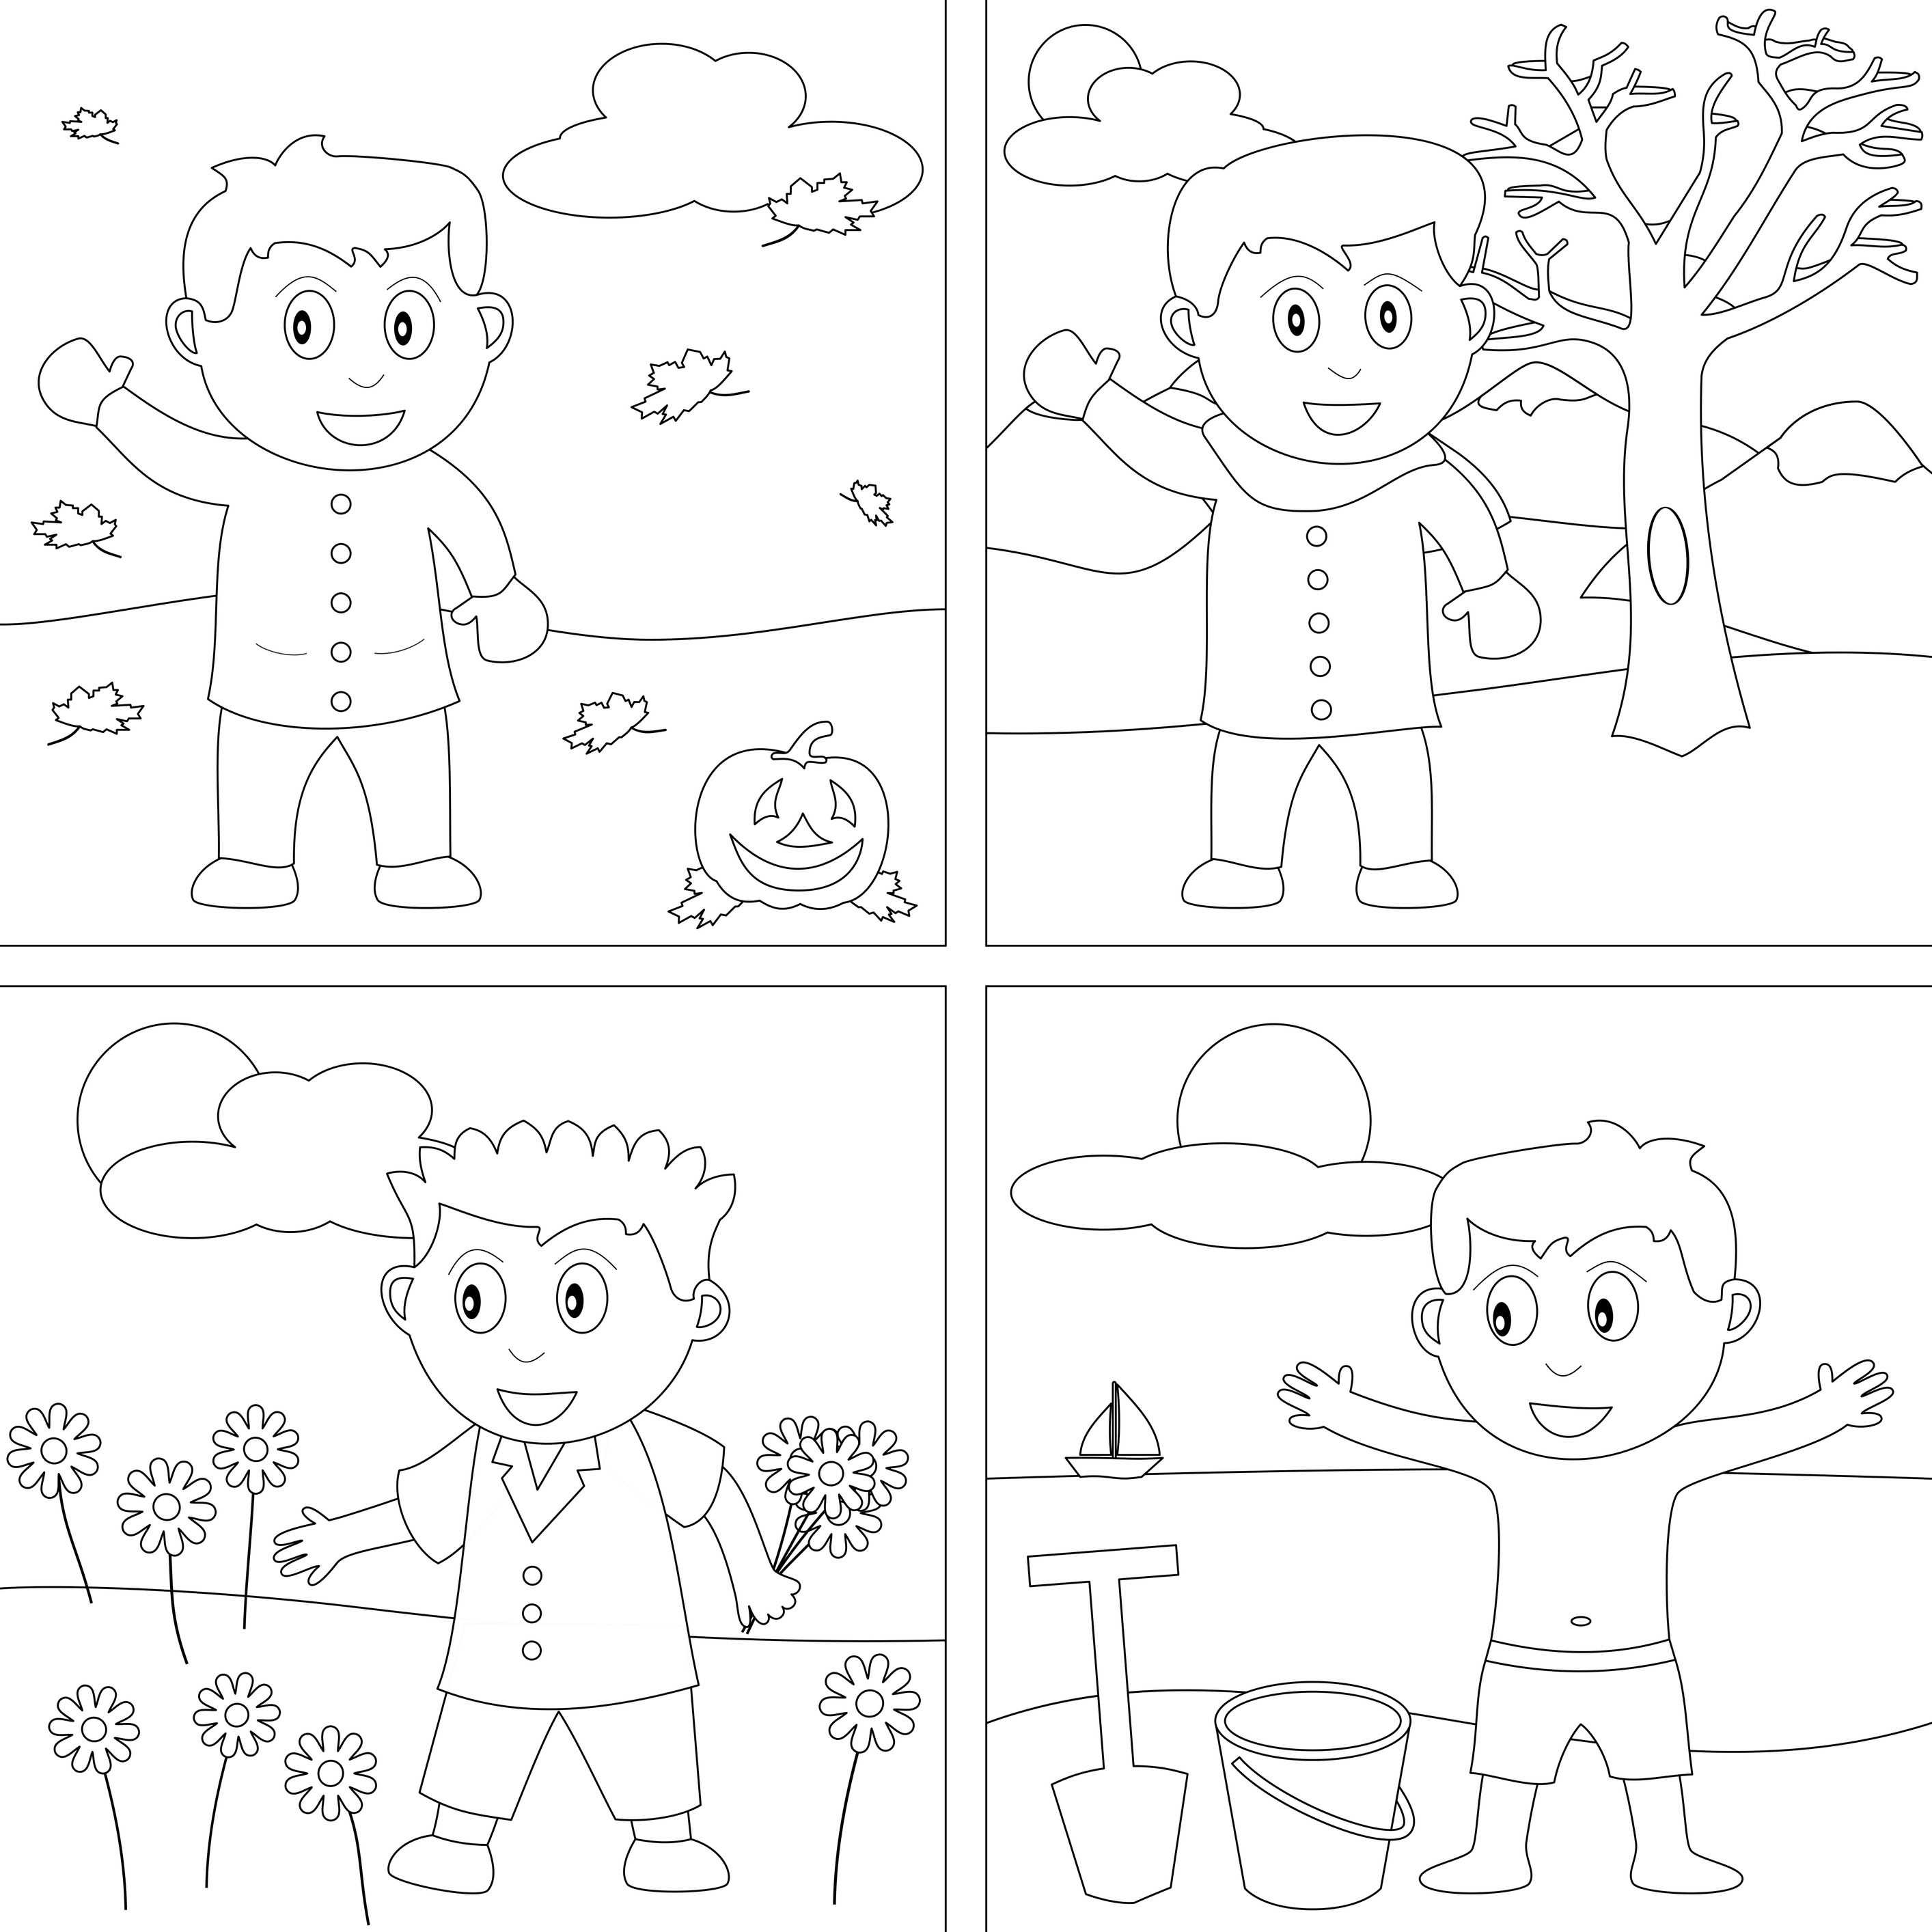 Coloring pages 4 seasons - Coloring Pages 4 Seasons 30